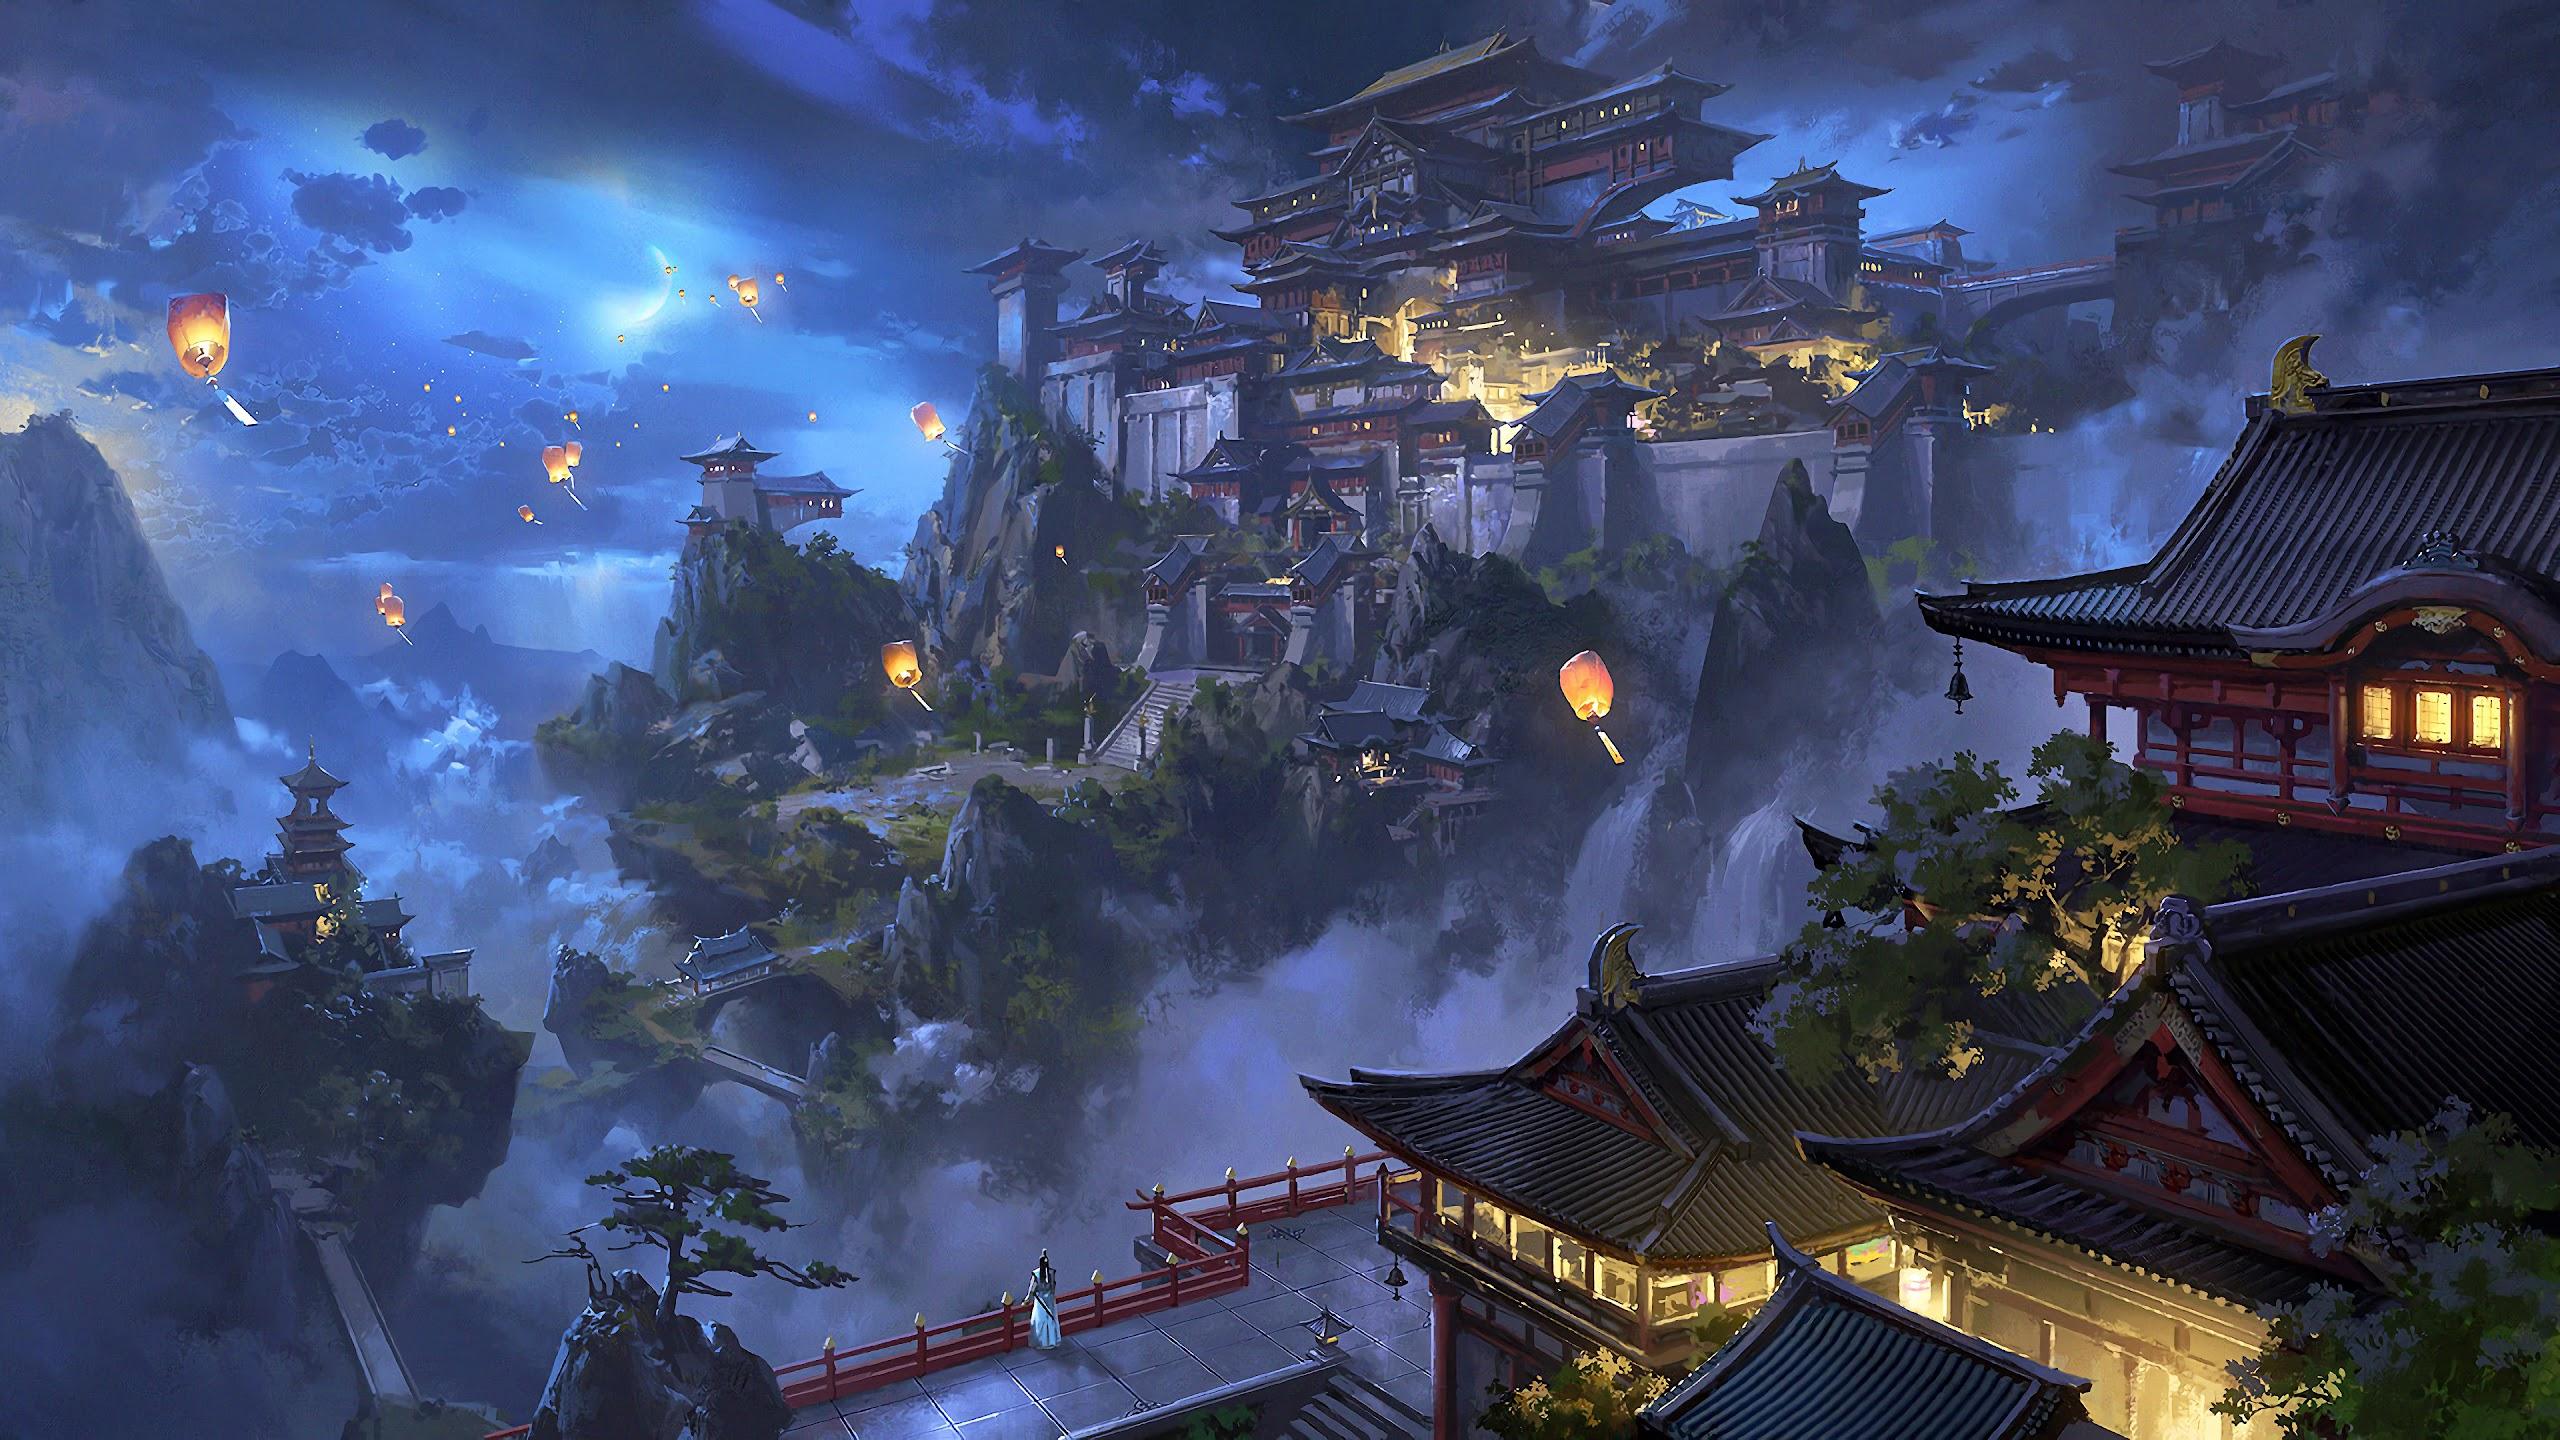 Anime Sky Lantern Mountain Japanese Castle Night Scenery 4k Wallpaper 106